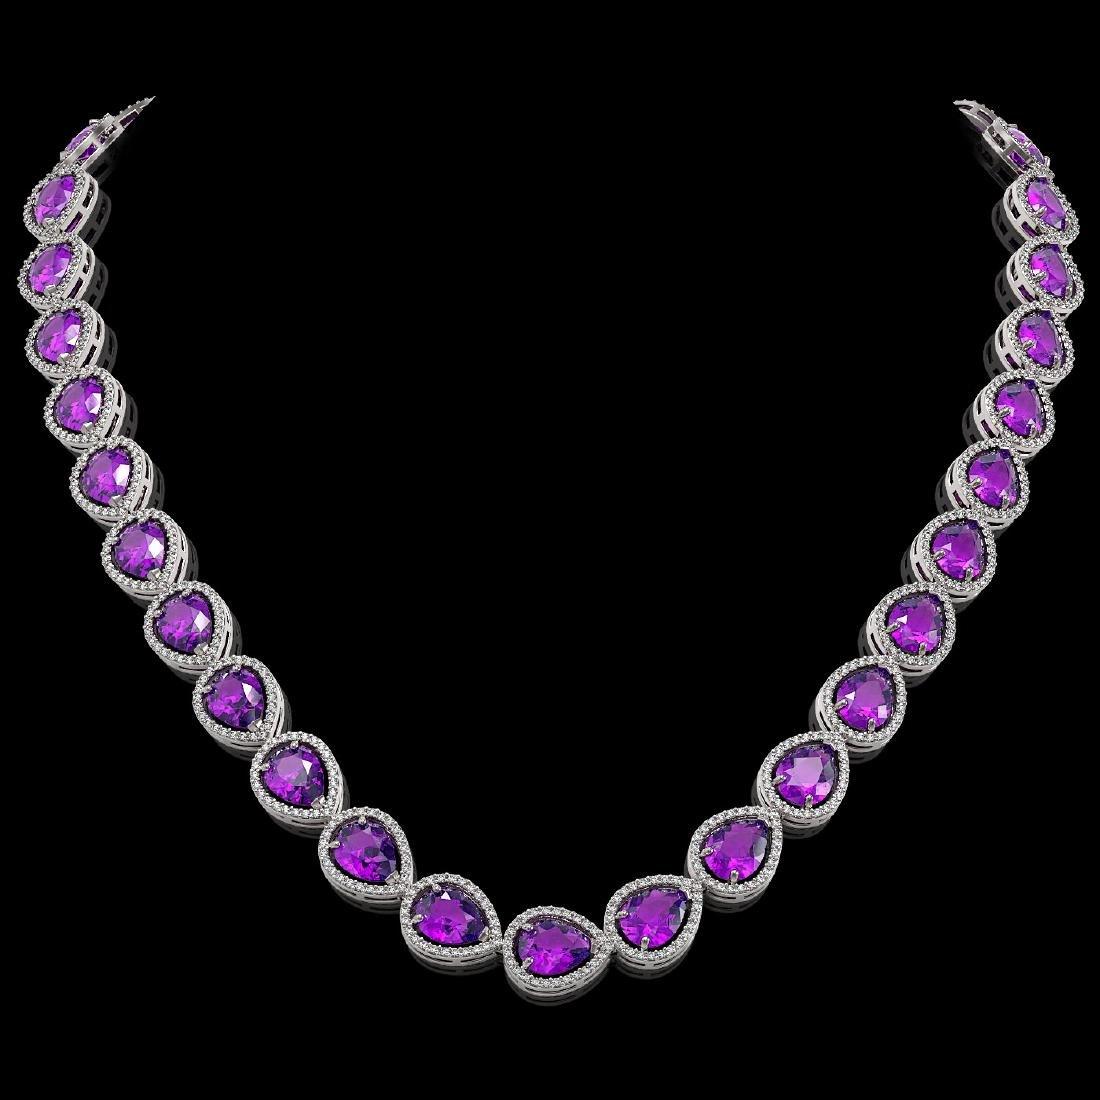 43.2 CTW Amethyst & Diamond Halo Necklace 10K White